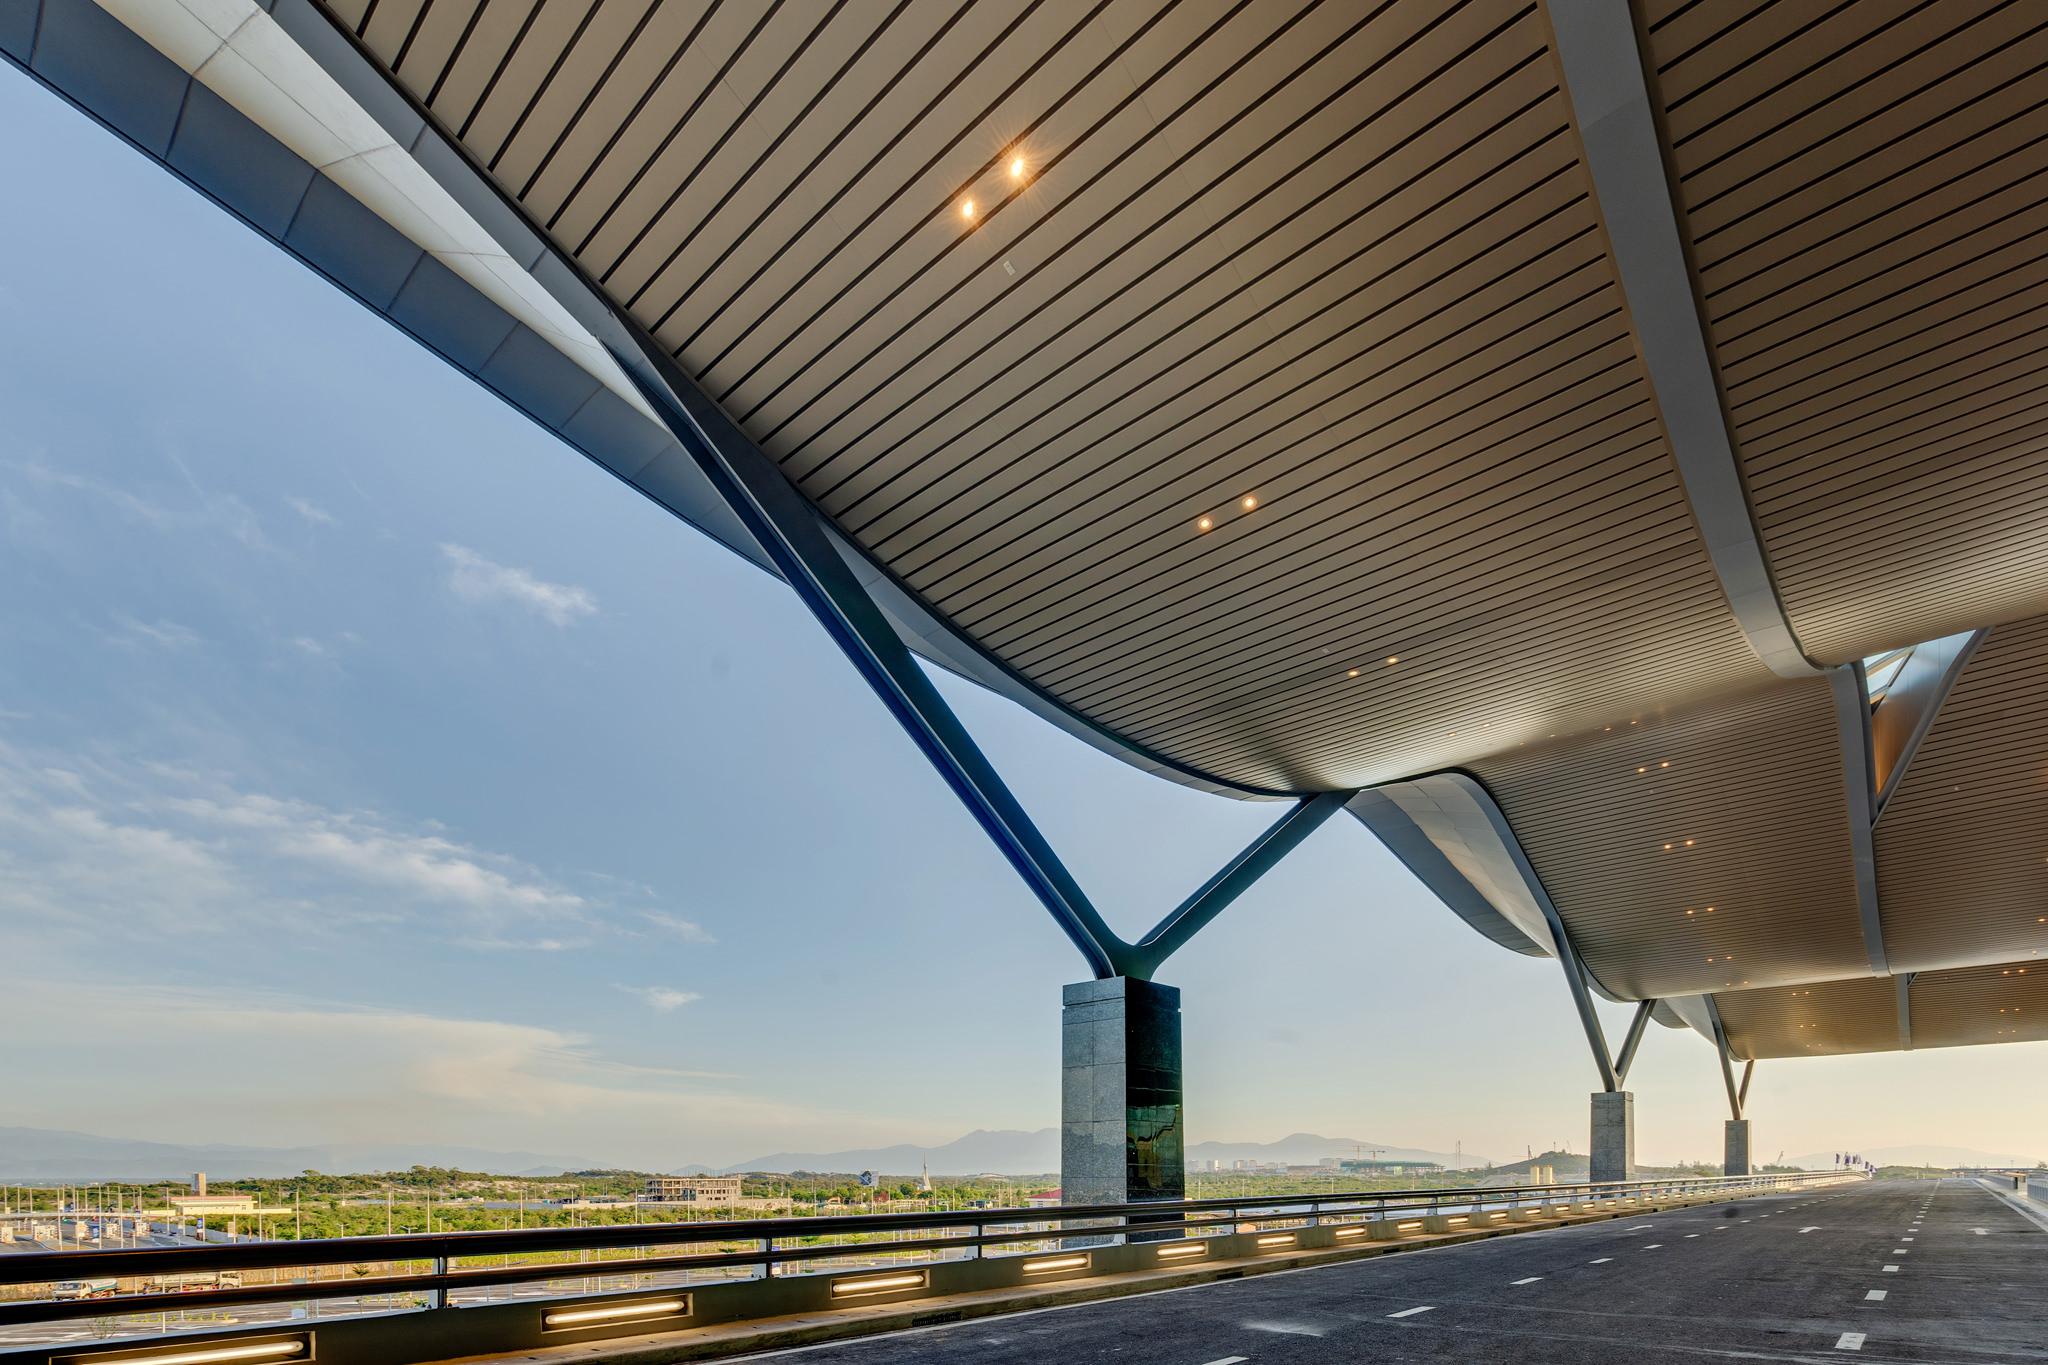 20180626 - Cam Ranh Airport - Architecture - 0064.jpg